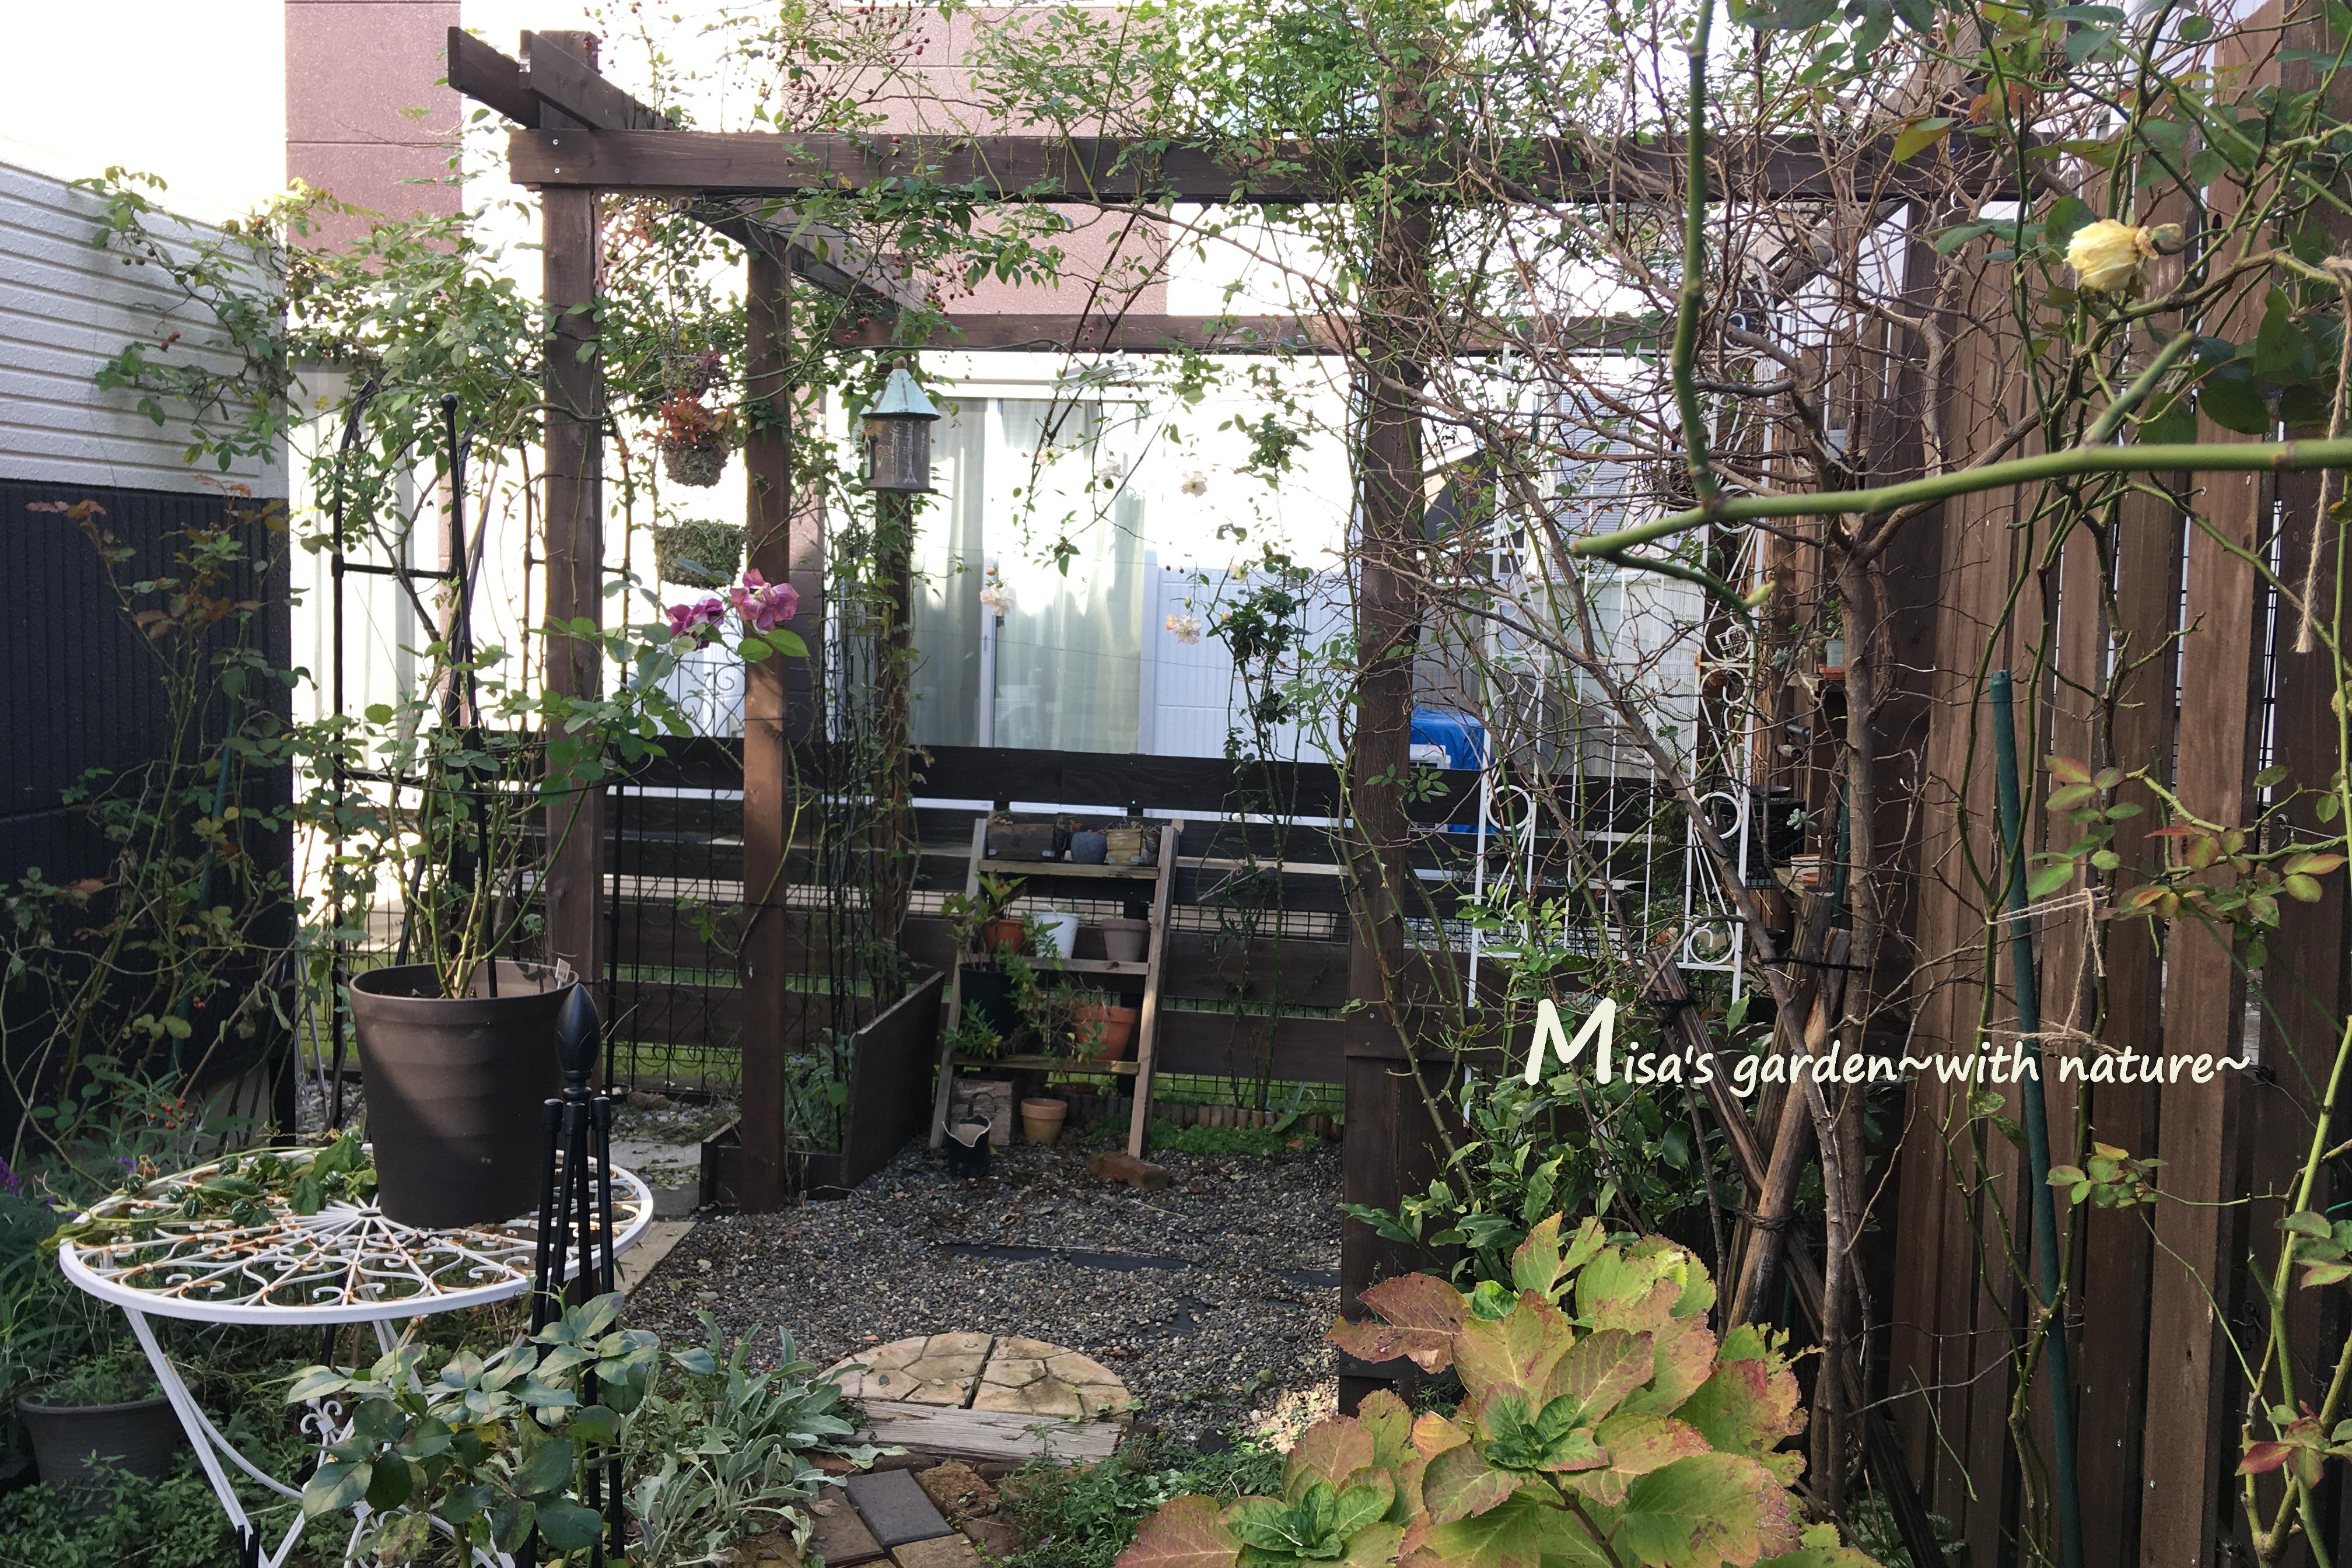 misa's garden